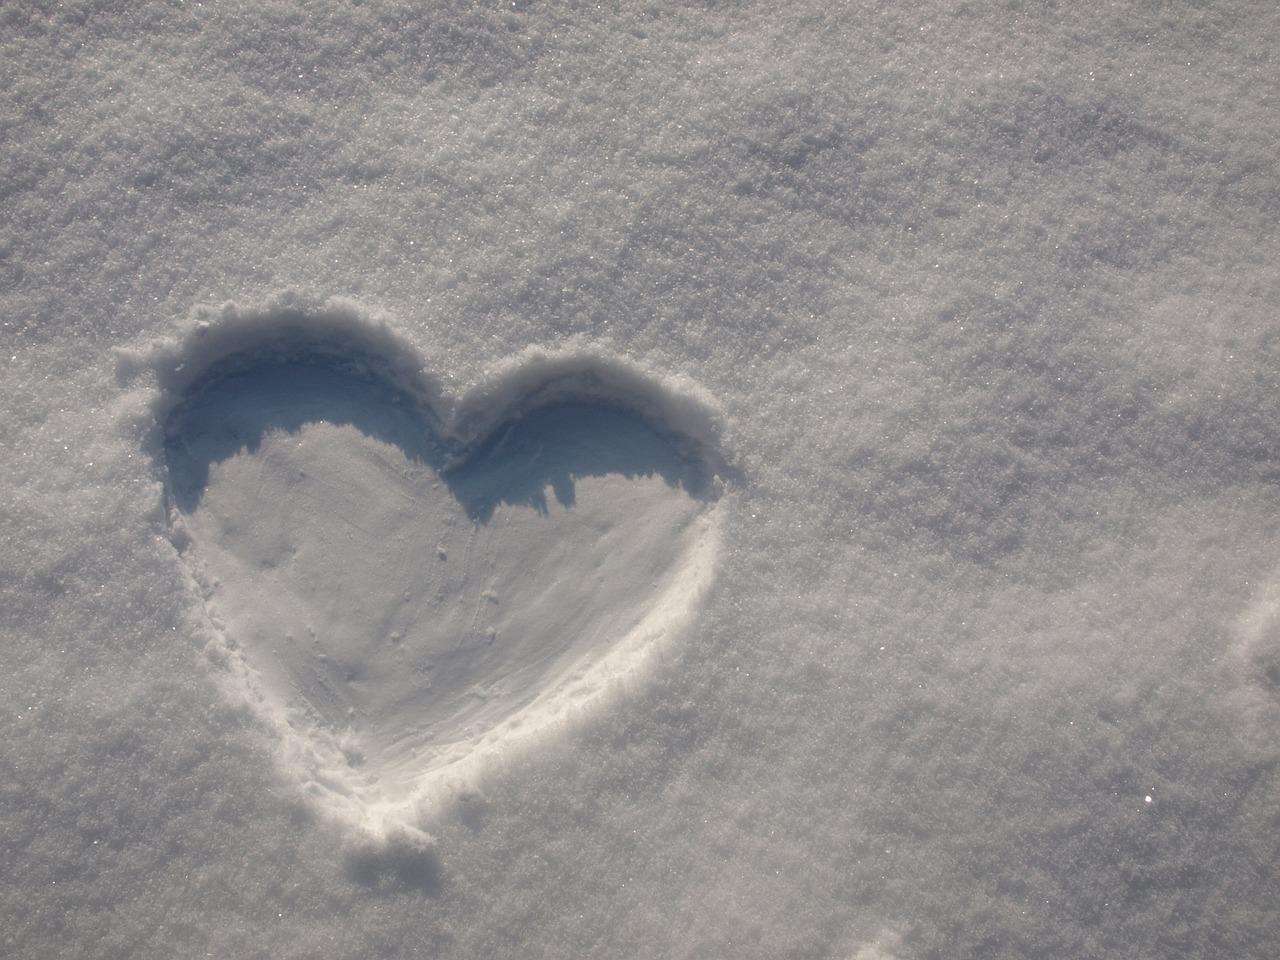 картинки сердце на снегу последнем фото окуляр